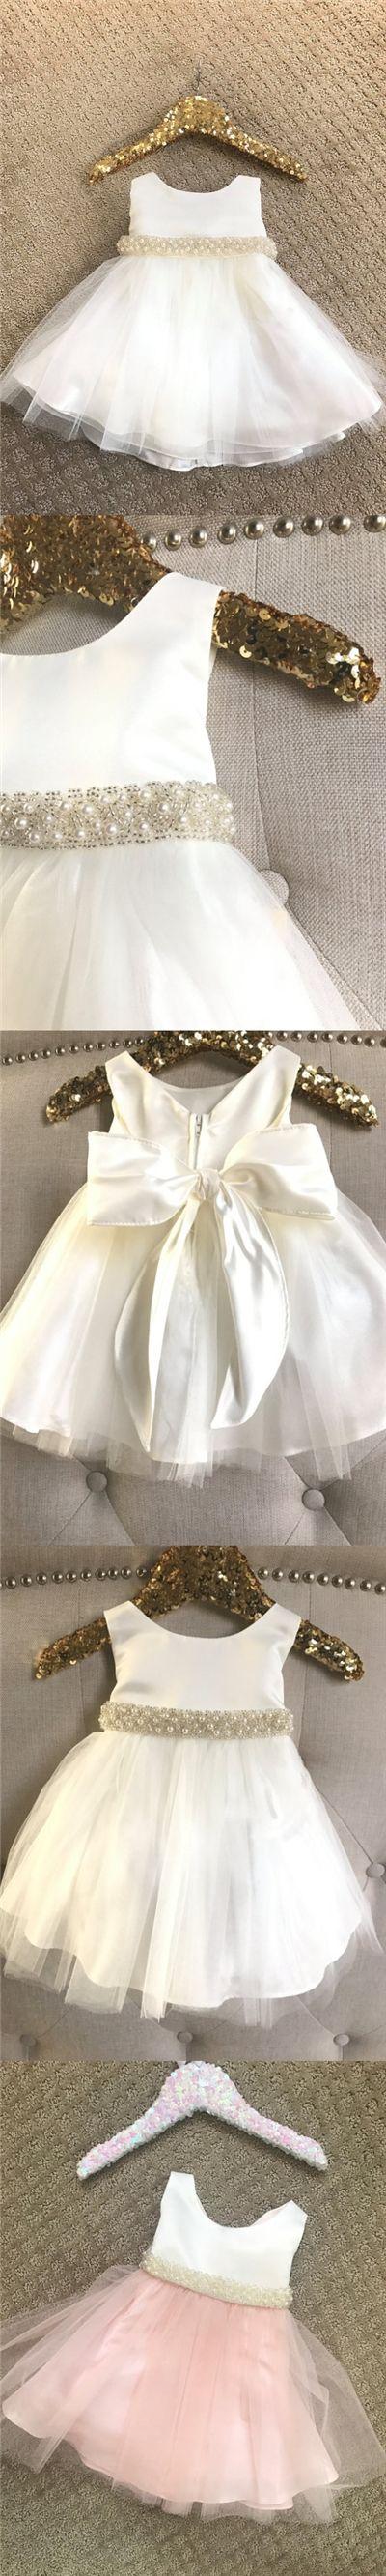 2017 Flower Girl Dresses Cute Ivory Pink Bowknot Beading Tulle JKF018